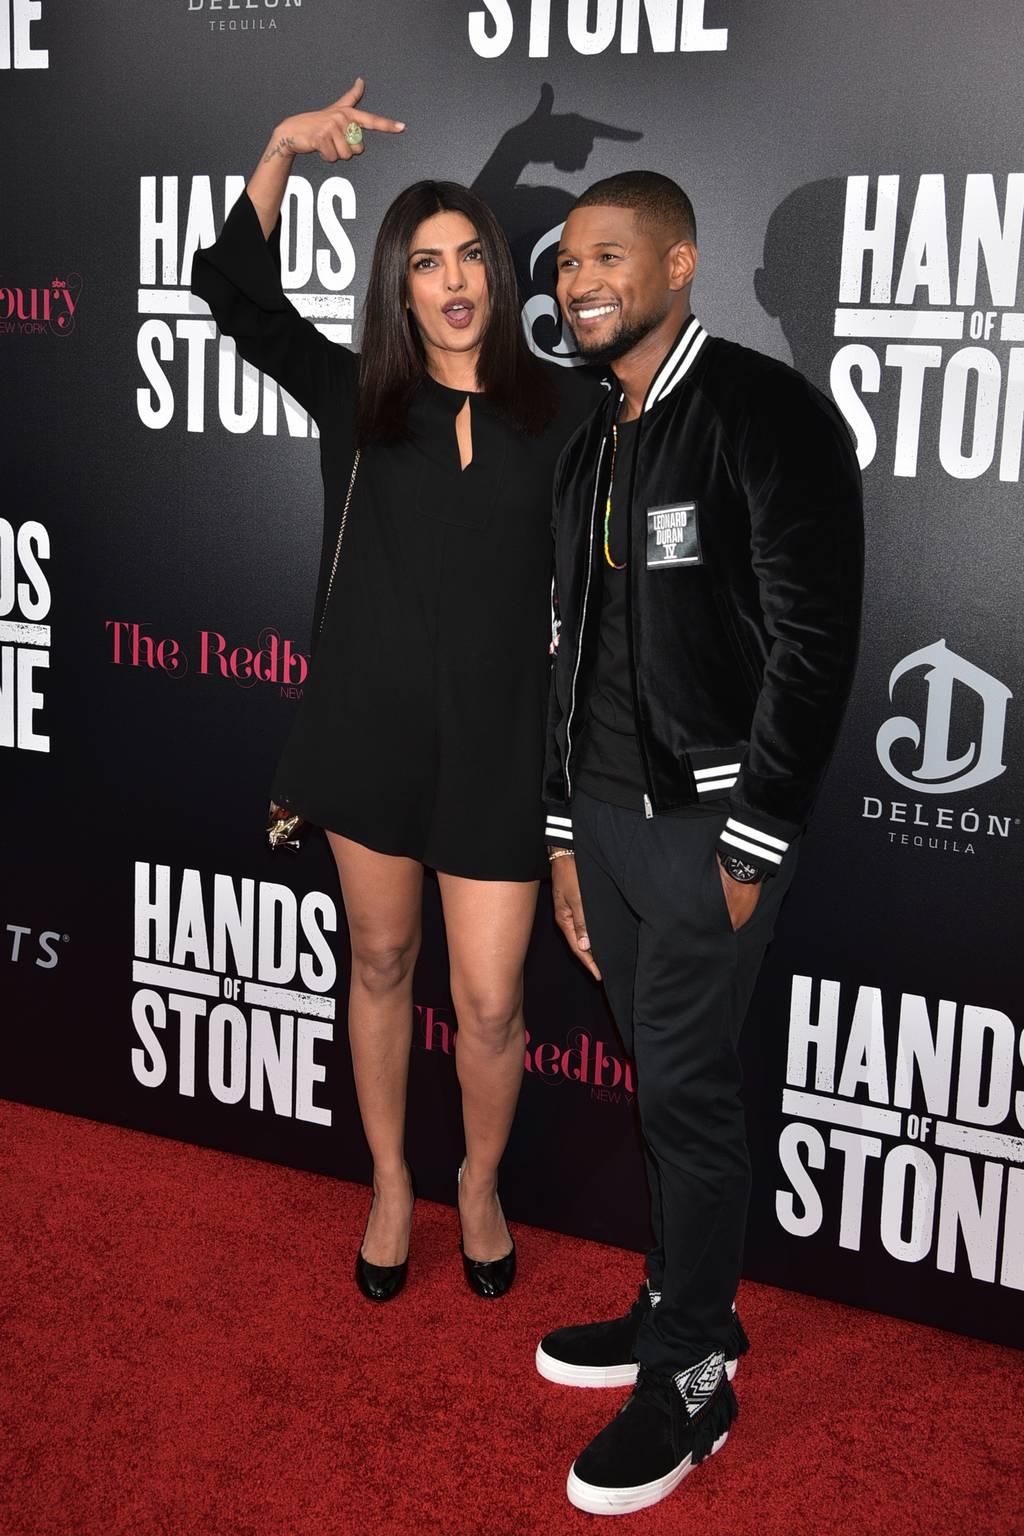 Priyanka Chopra – Hands of Stone Film Premiere in New York on August 22, 2016